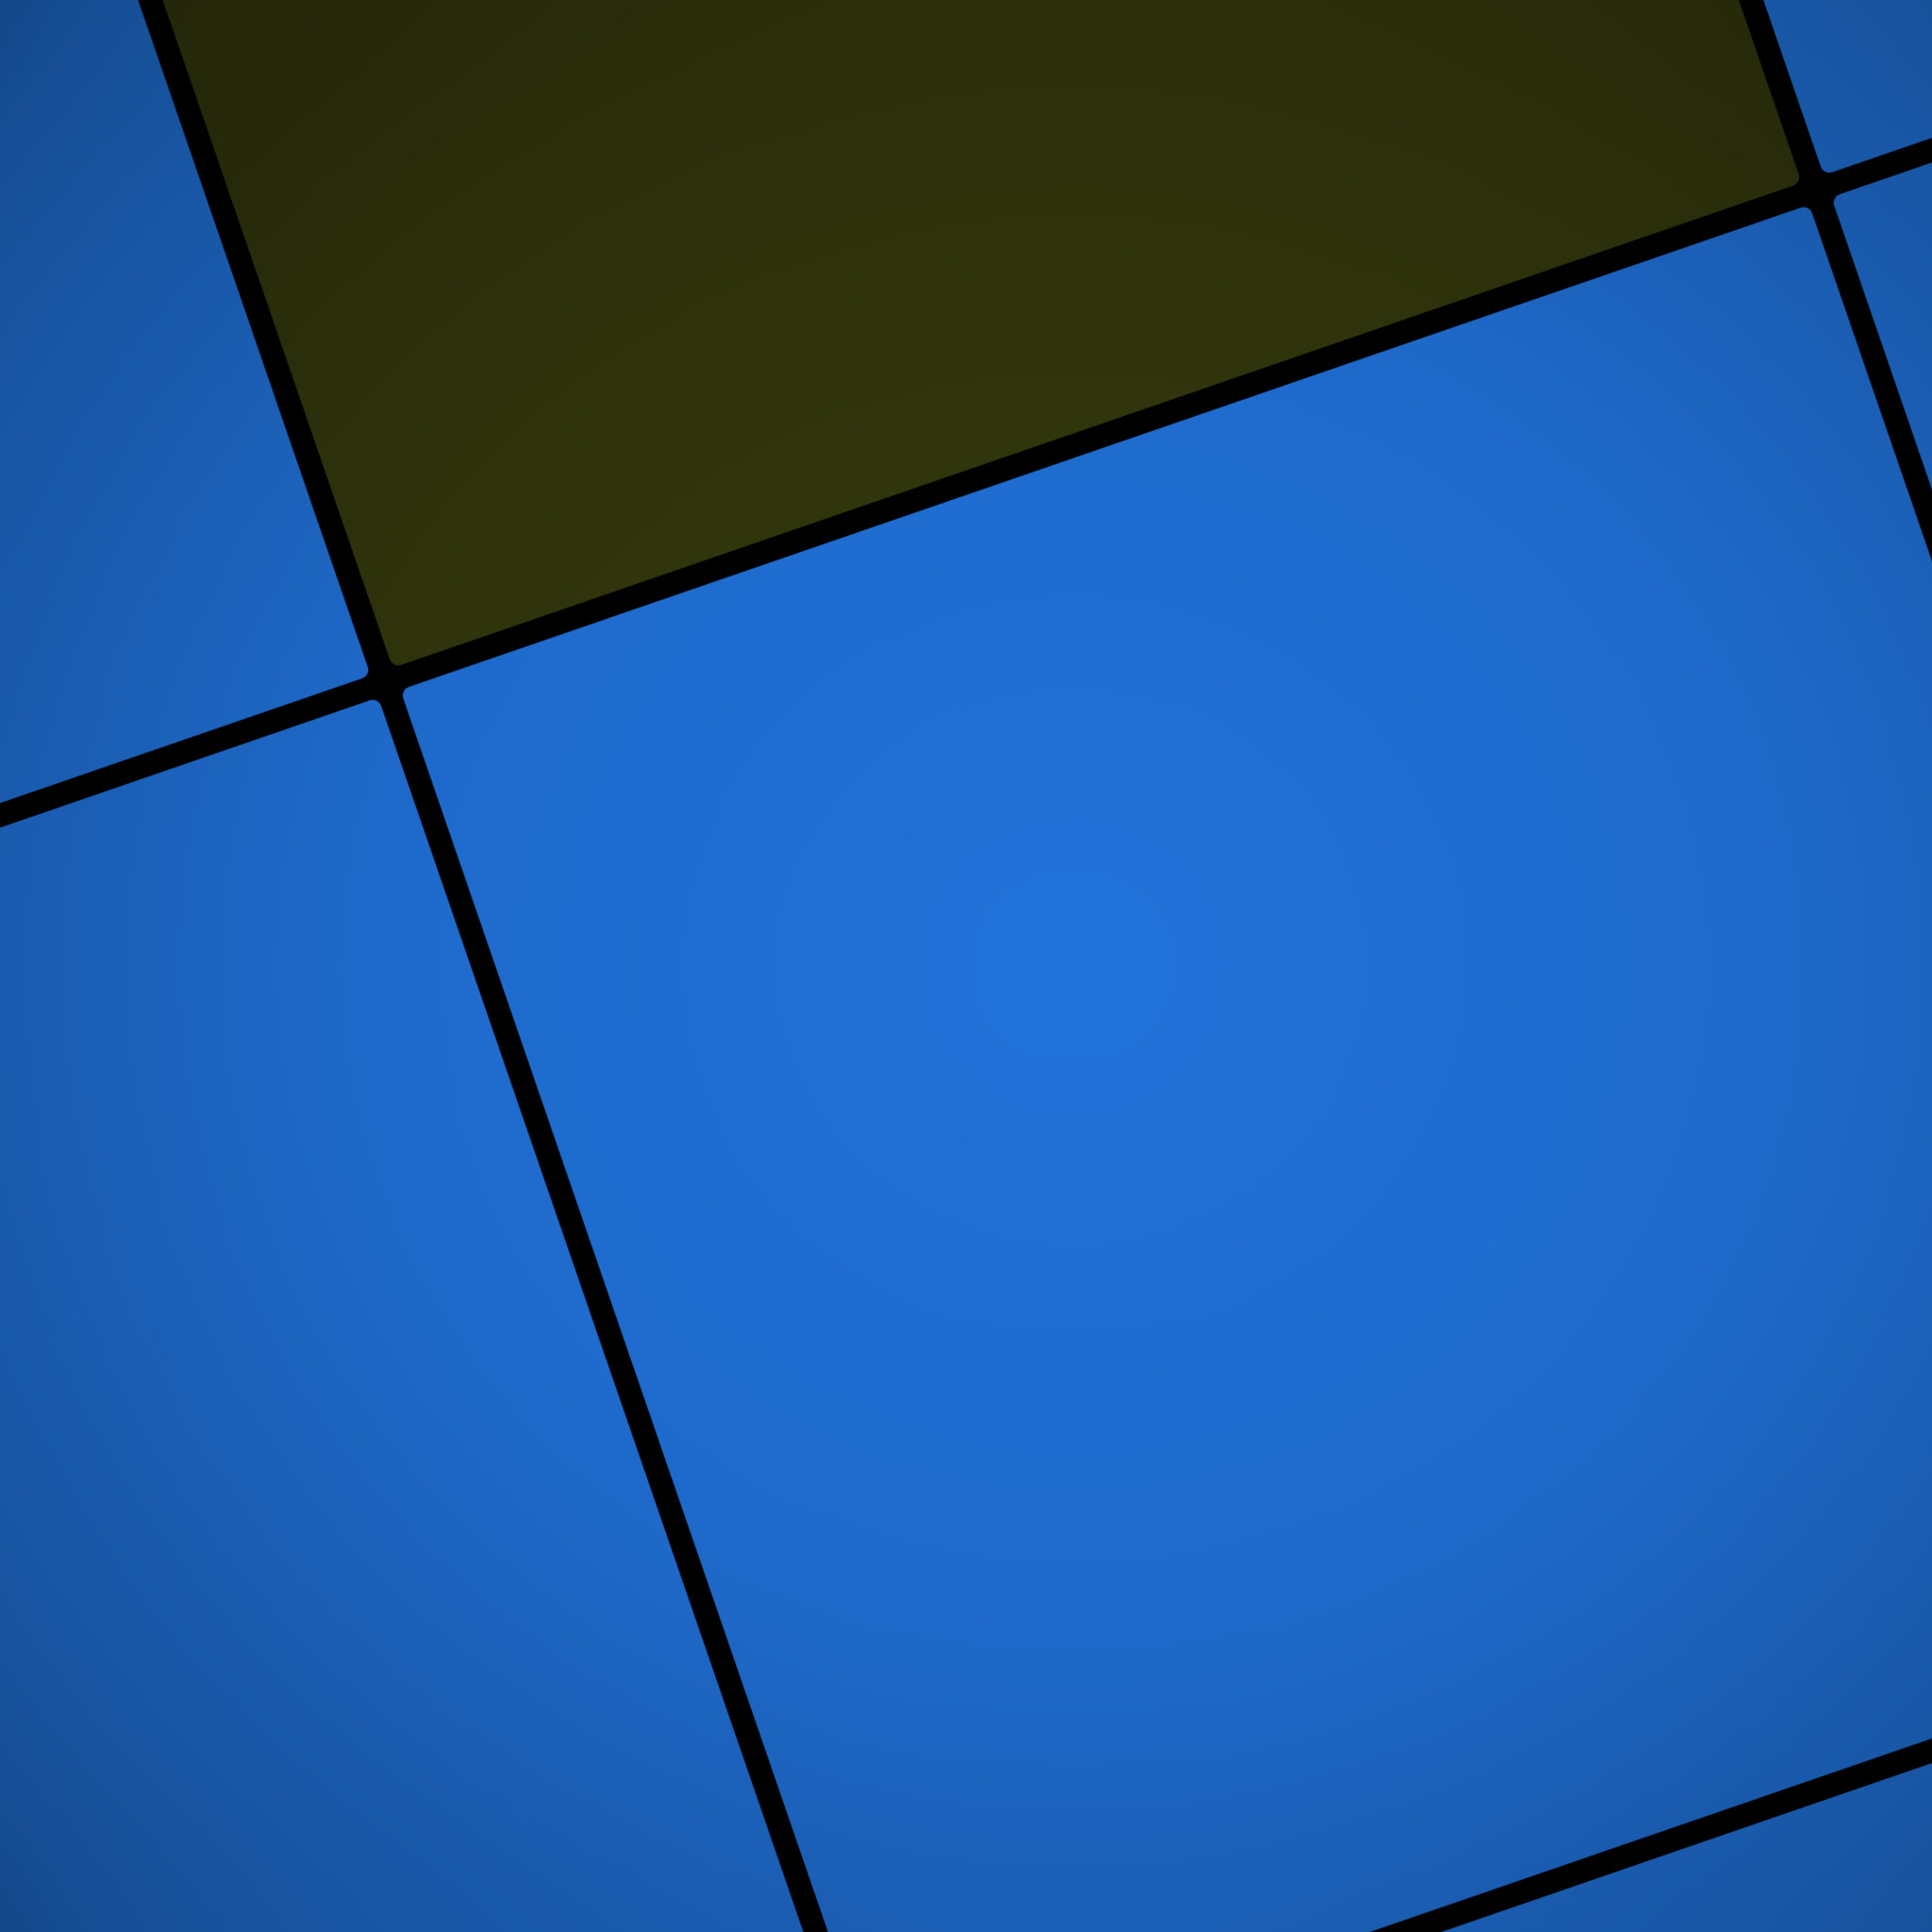 2048x2048 4k Abstract Ipad Air HD 4k Wallpapers, Images